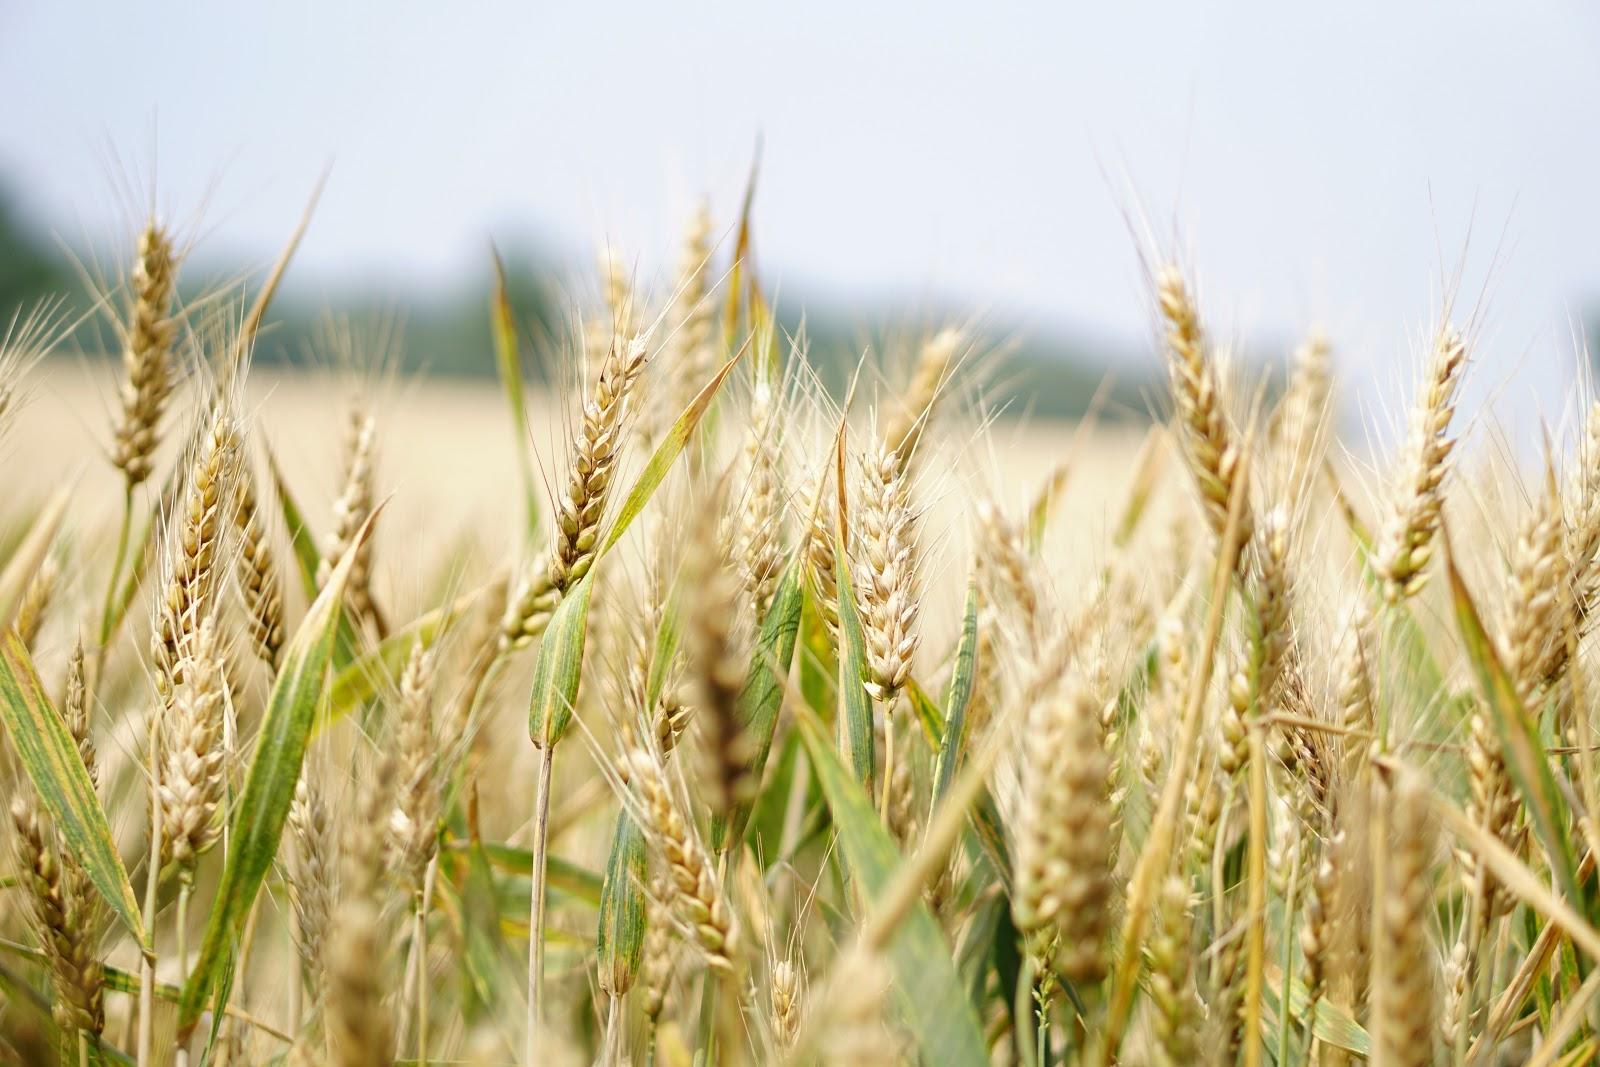 brown crops in a field